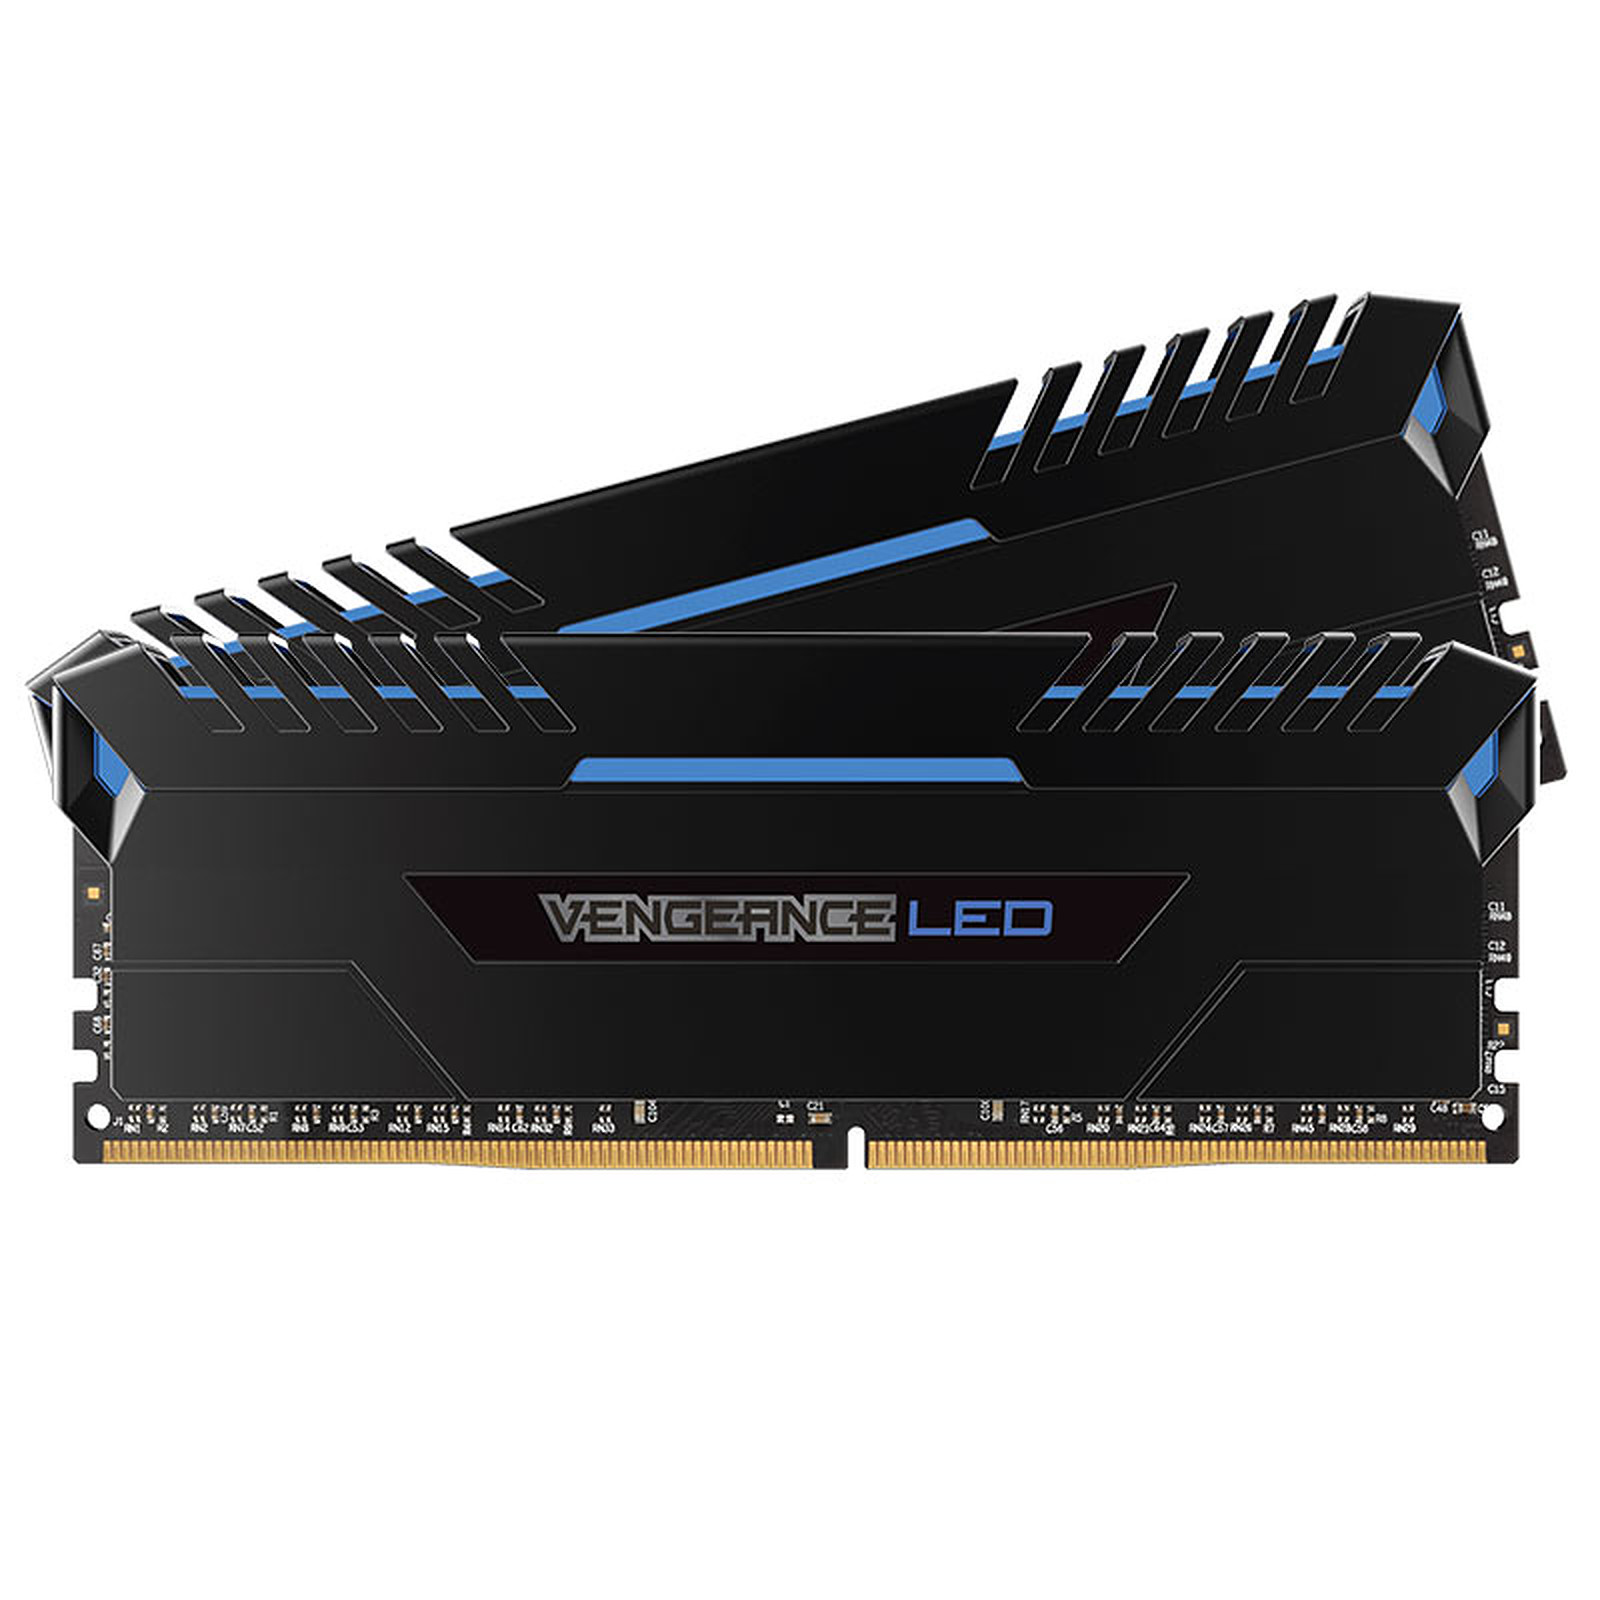 Corsair Vengeance LED Series 32 Go (2x 16 Go) DDR4 3000 MHz CL15 - Bleu